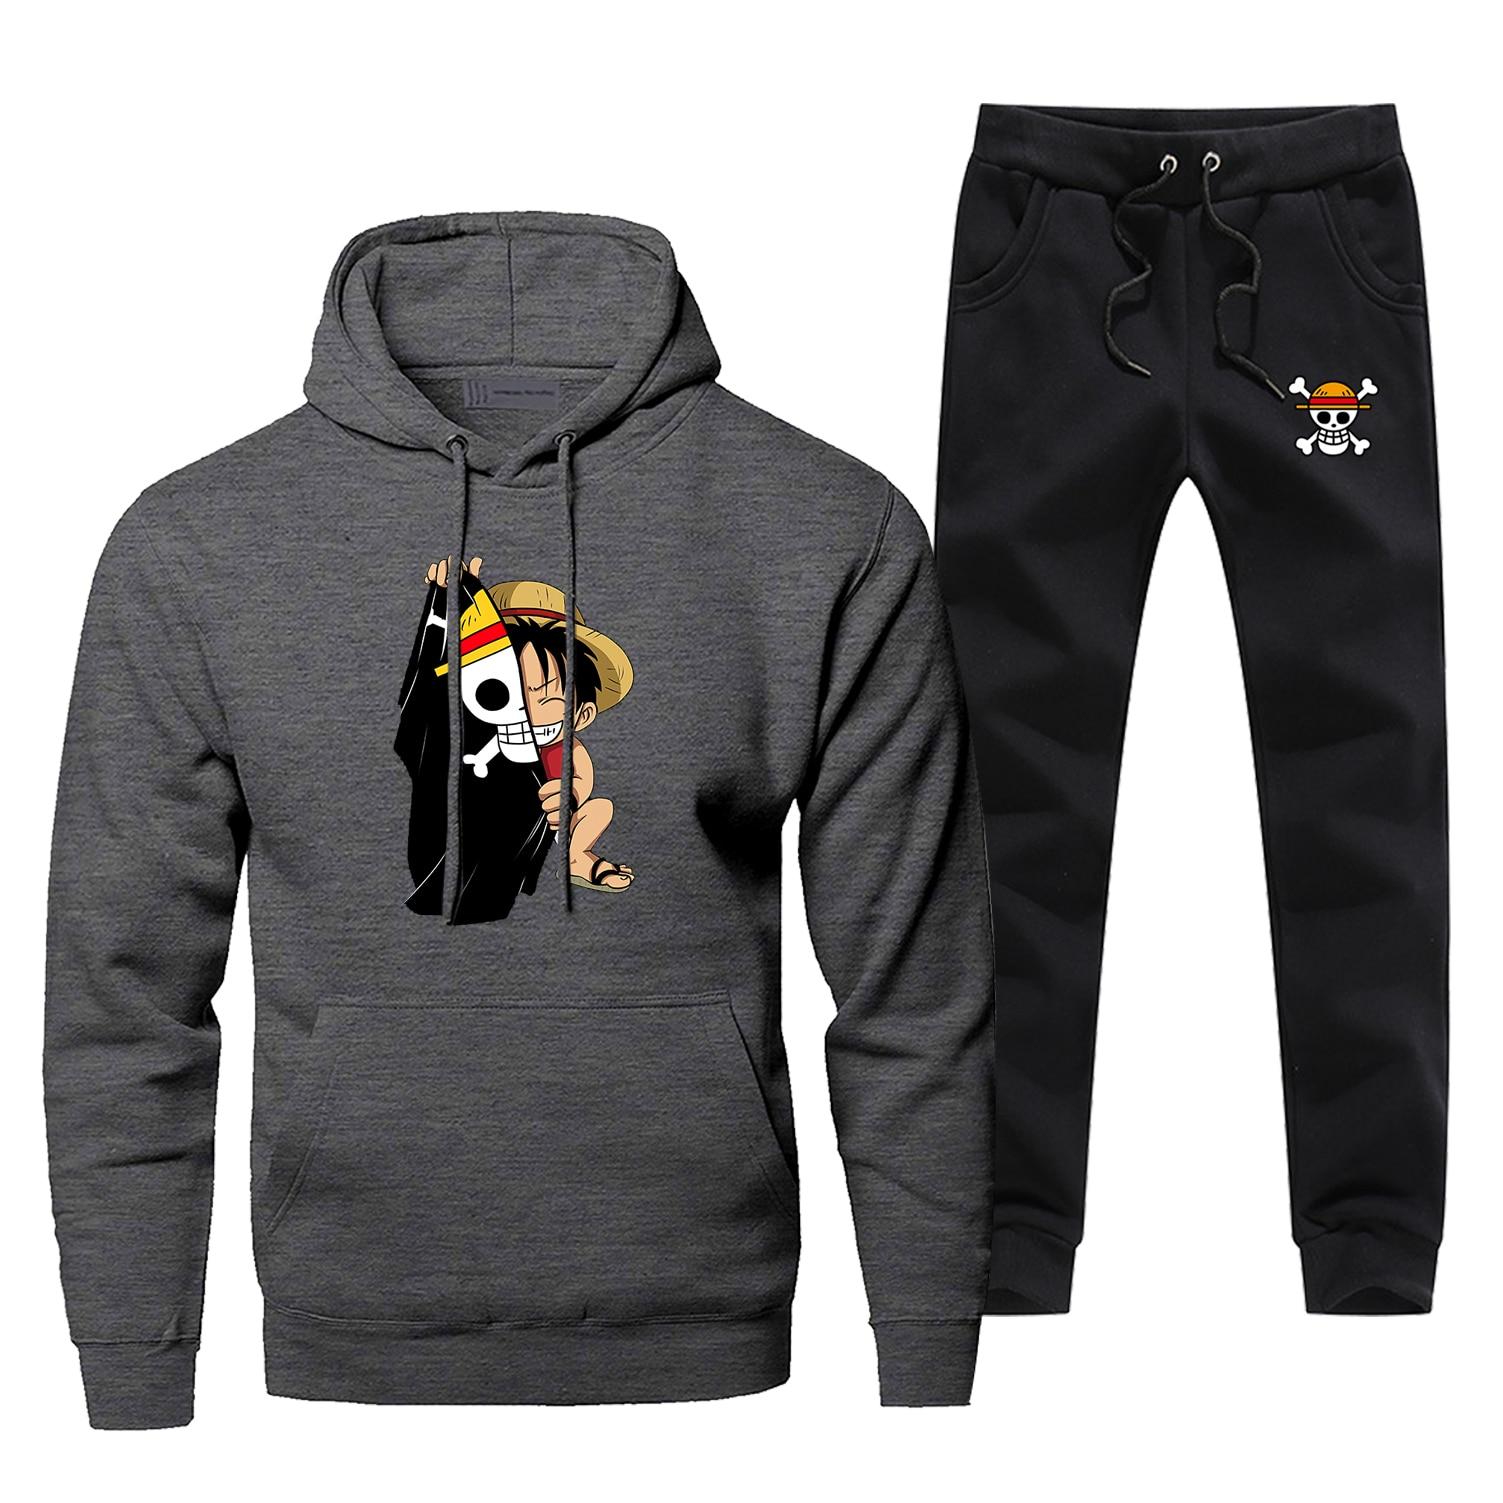 One Piece Hoodies Pants Men Set Anime Luffy The Straw Hat Pirates Sweatshirt Sweatpants Sportswear Autumn Sports 2 PCS Tracksuit